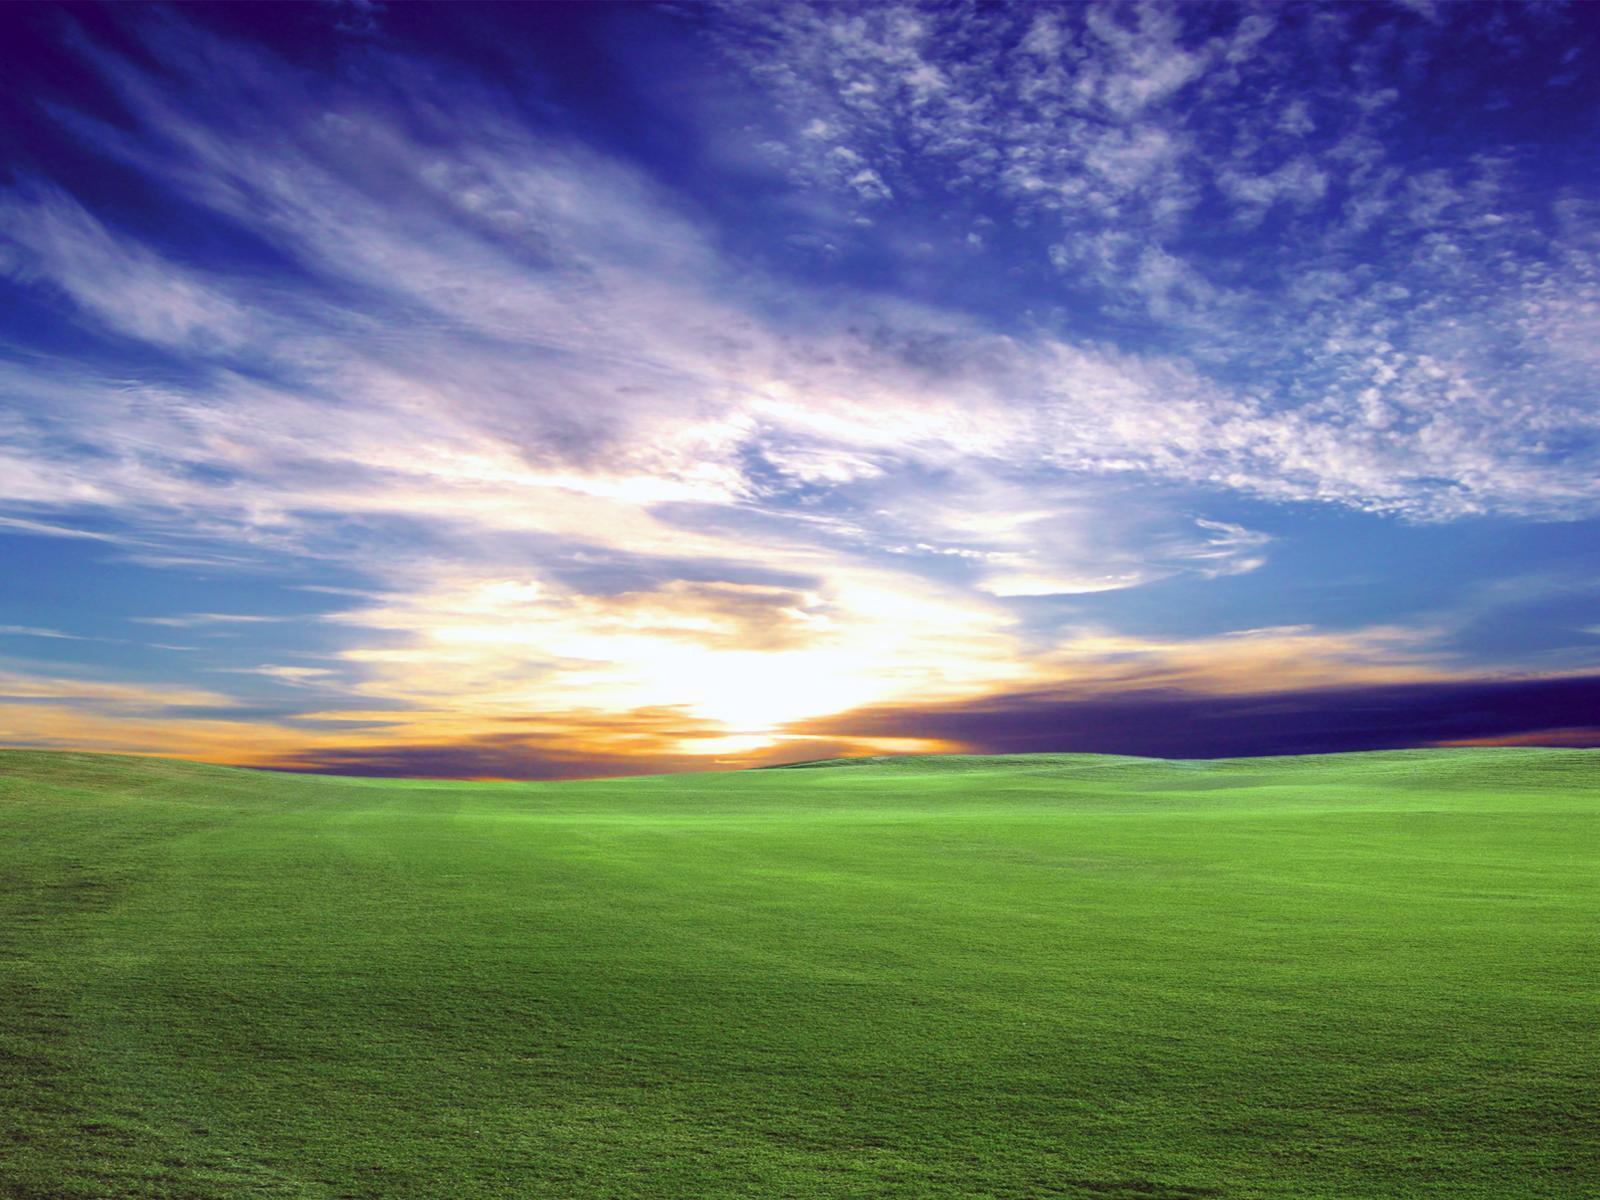 Desktop Themes Free Download: All Photos Gallery: Desktop Wallpapers, Free Desktop